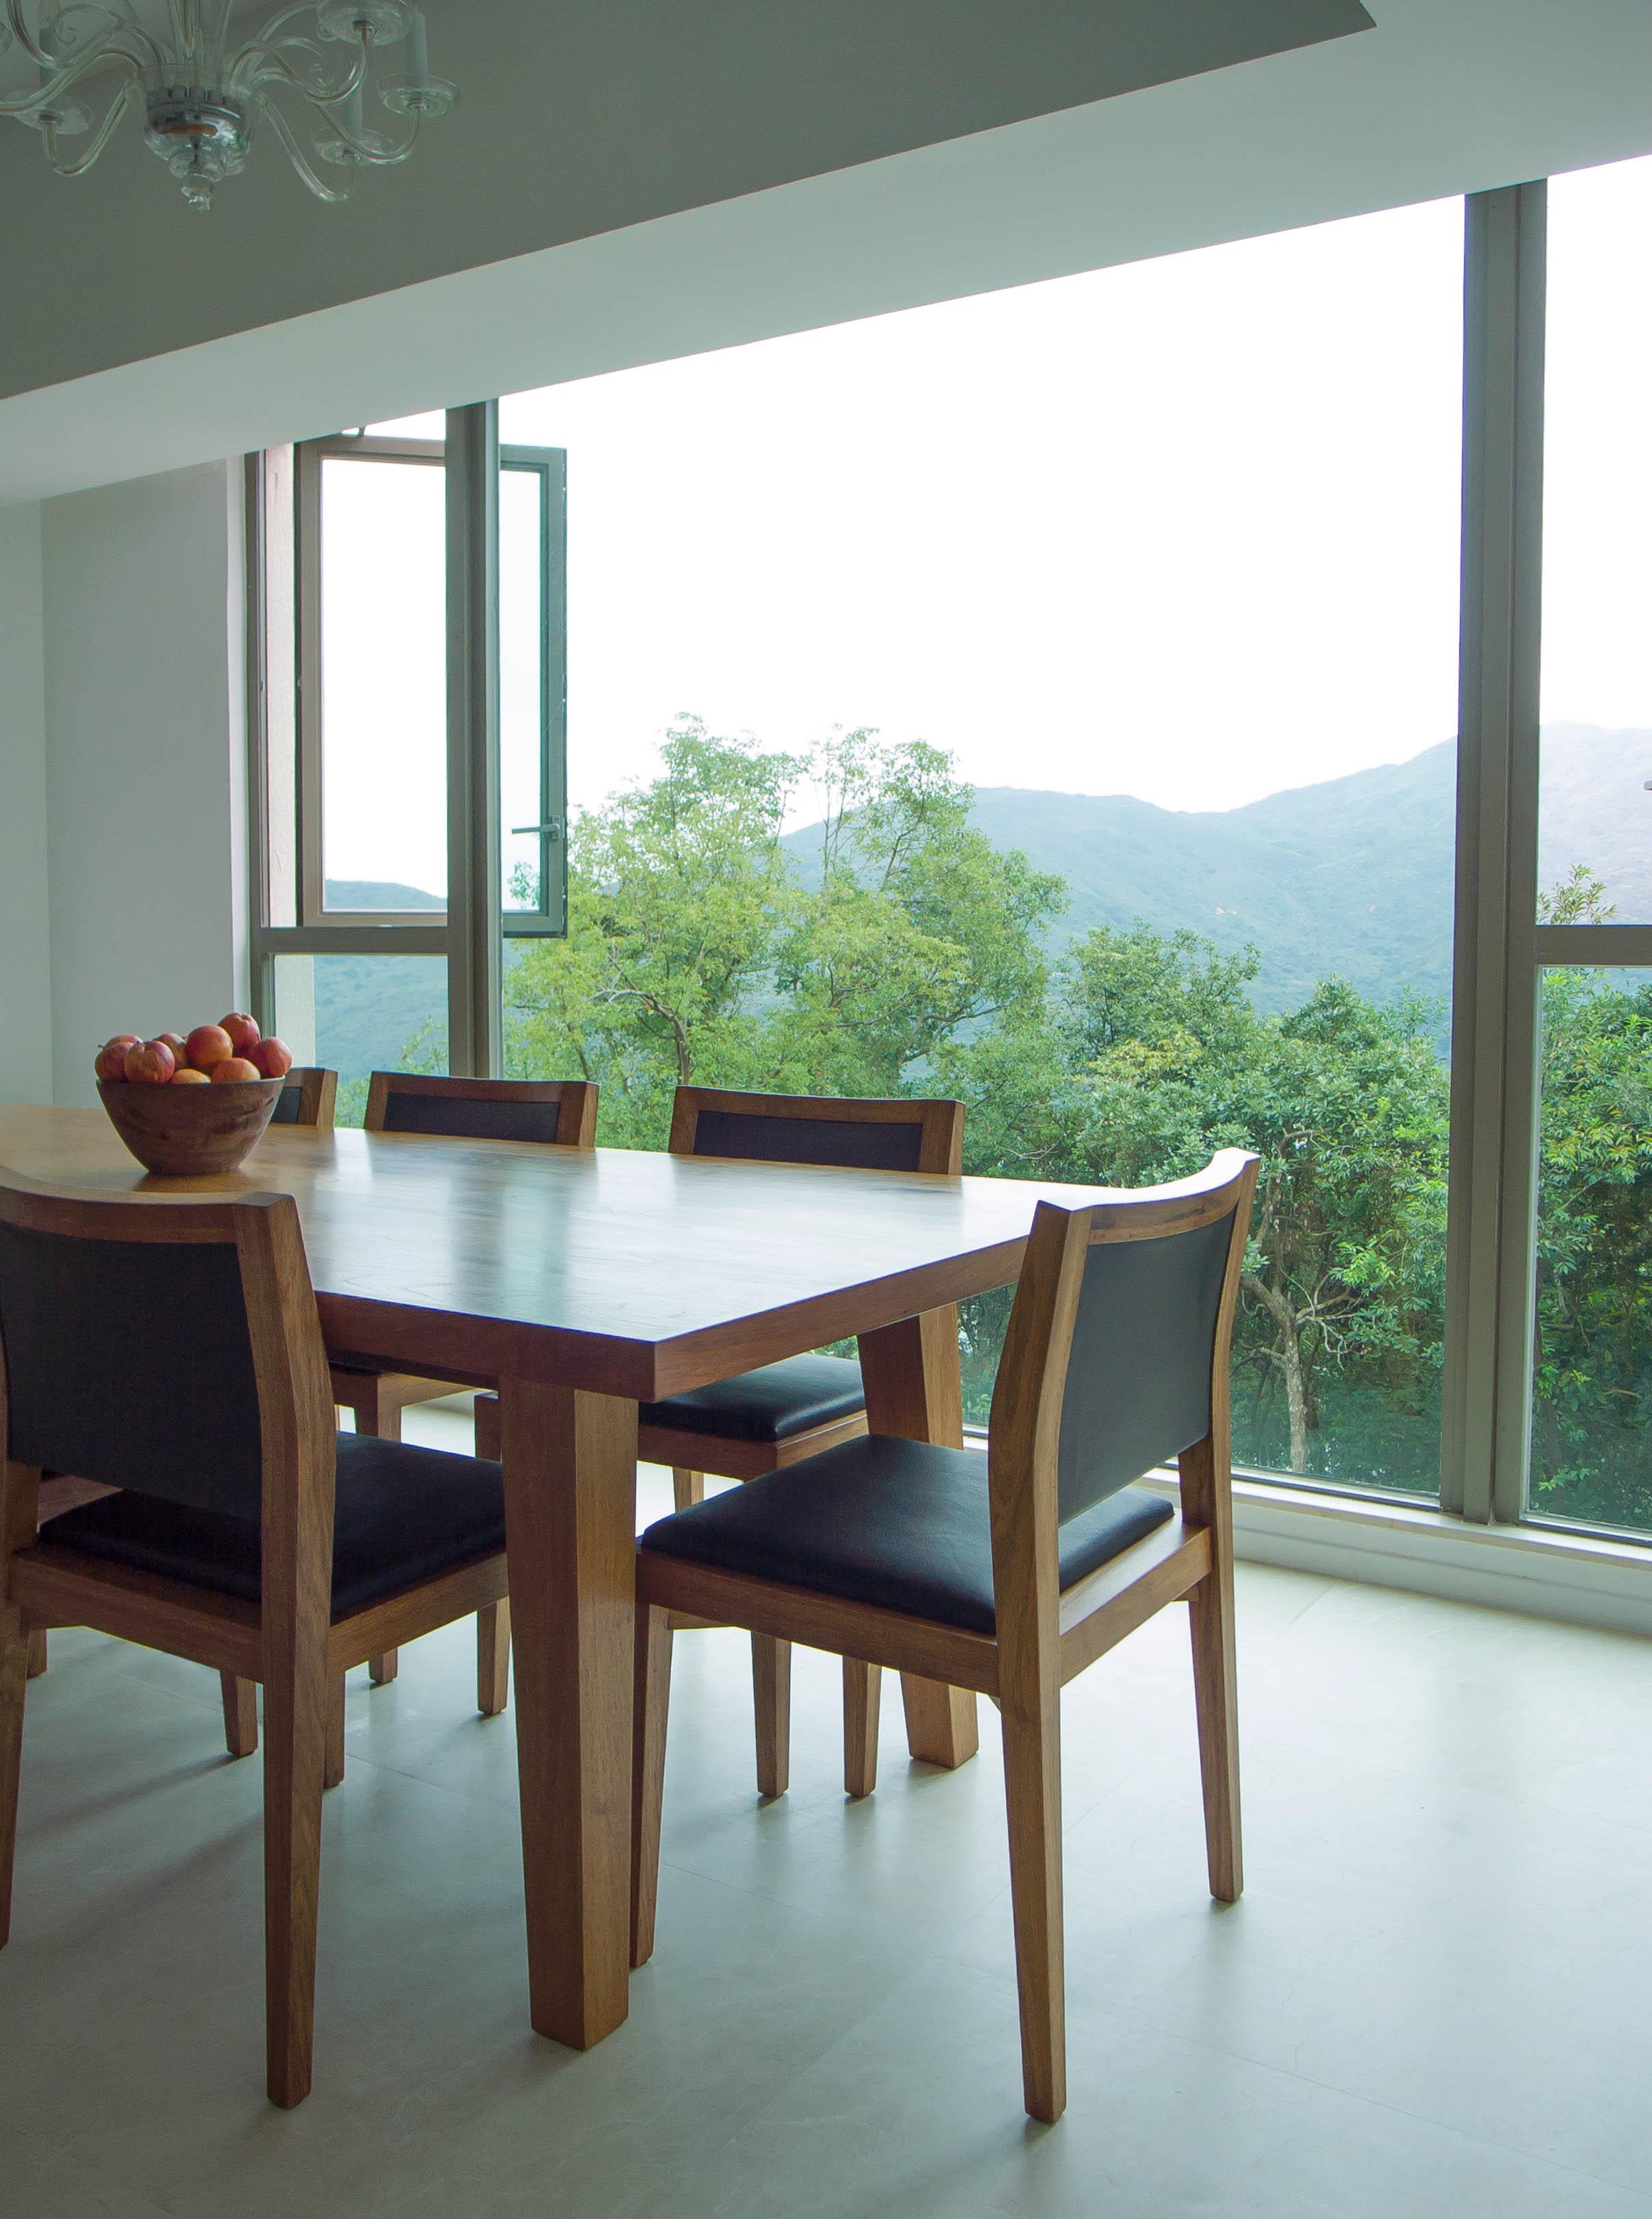 ....bespoke modern furniture : dining table ..特别定制摩登家具 : 餐台....